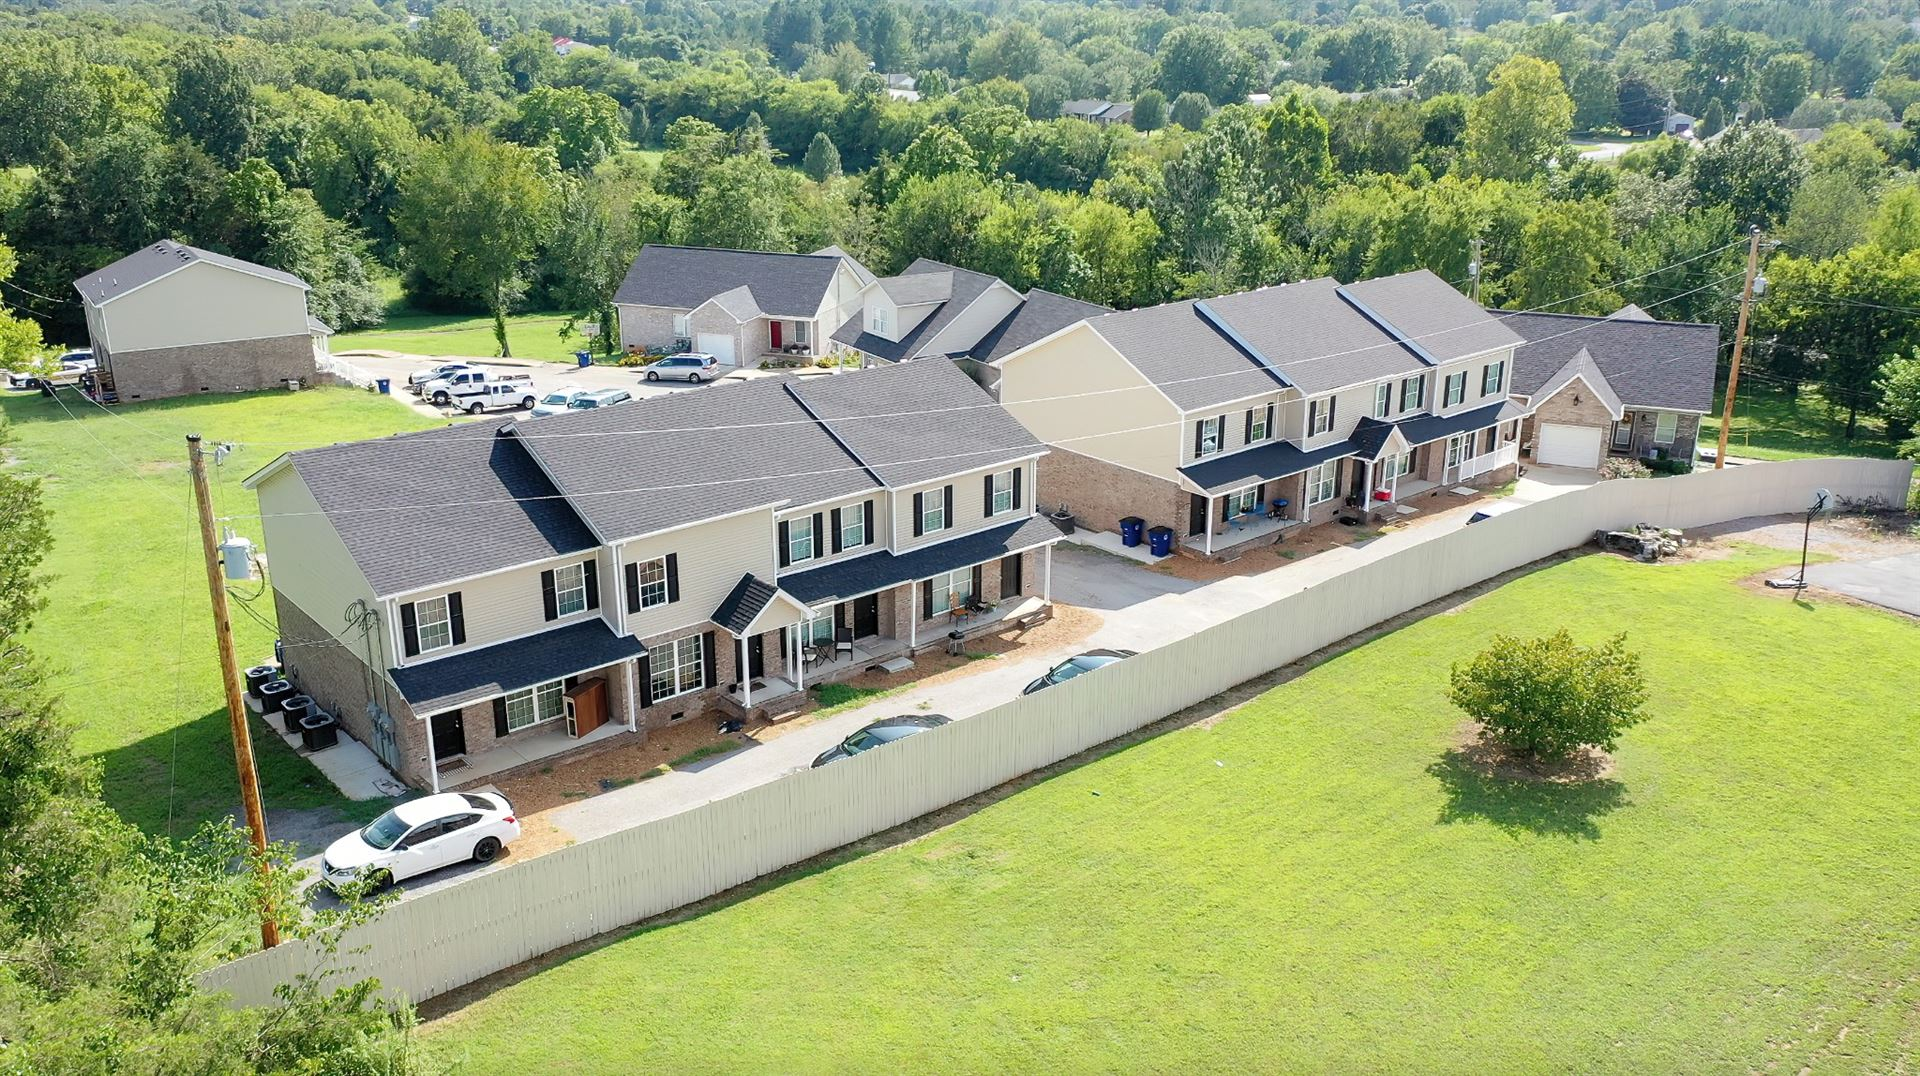 1605 S Cannon Blvd, Shelbyville, TN 37160 - MLS#: 2285075